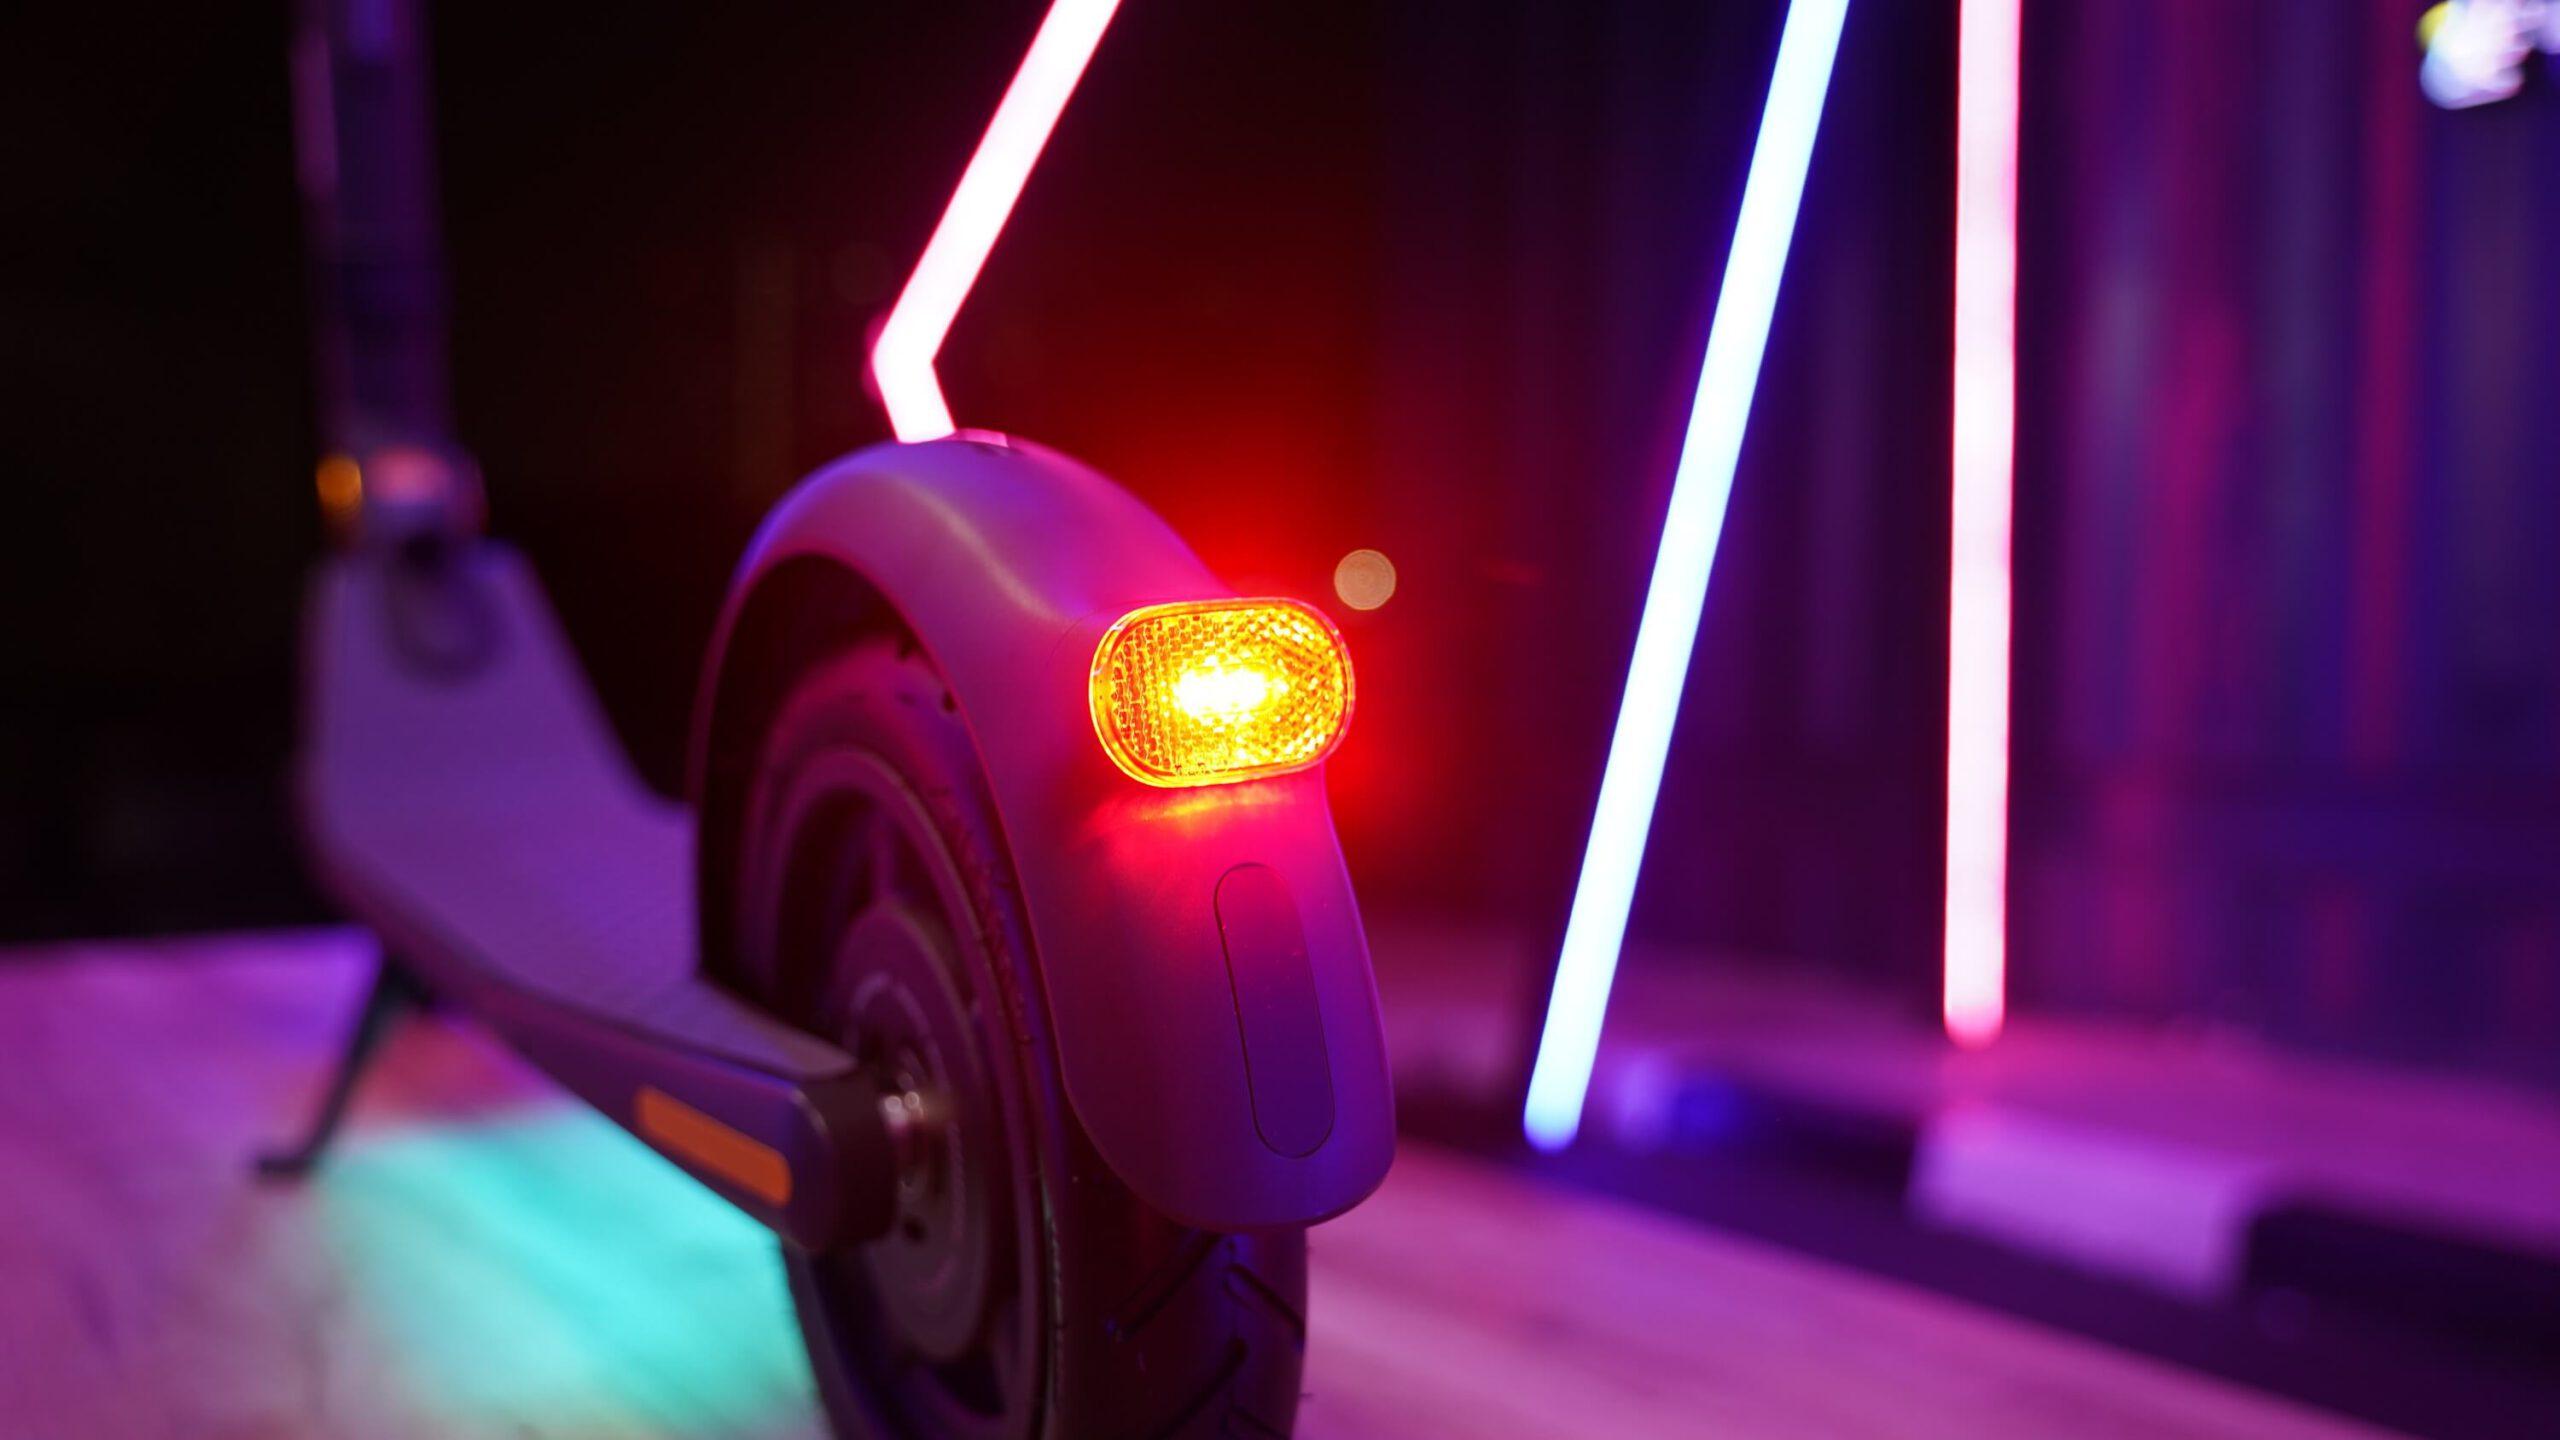 ninebot kickscooter e25-ไฟหน้า